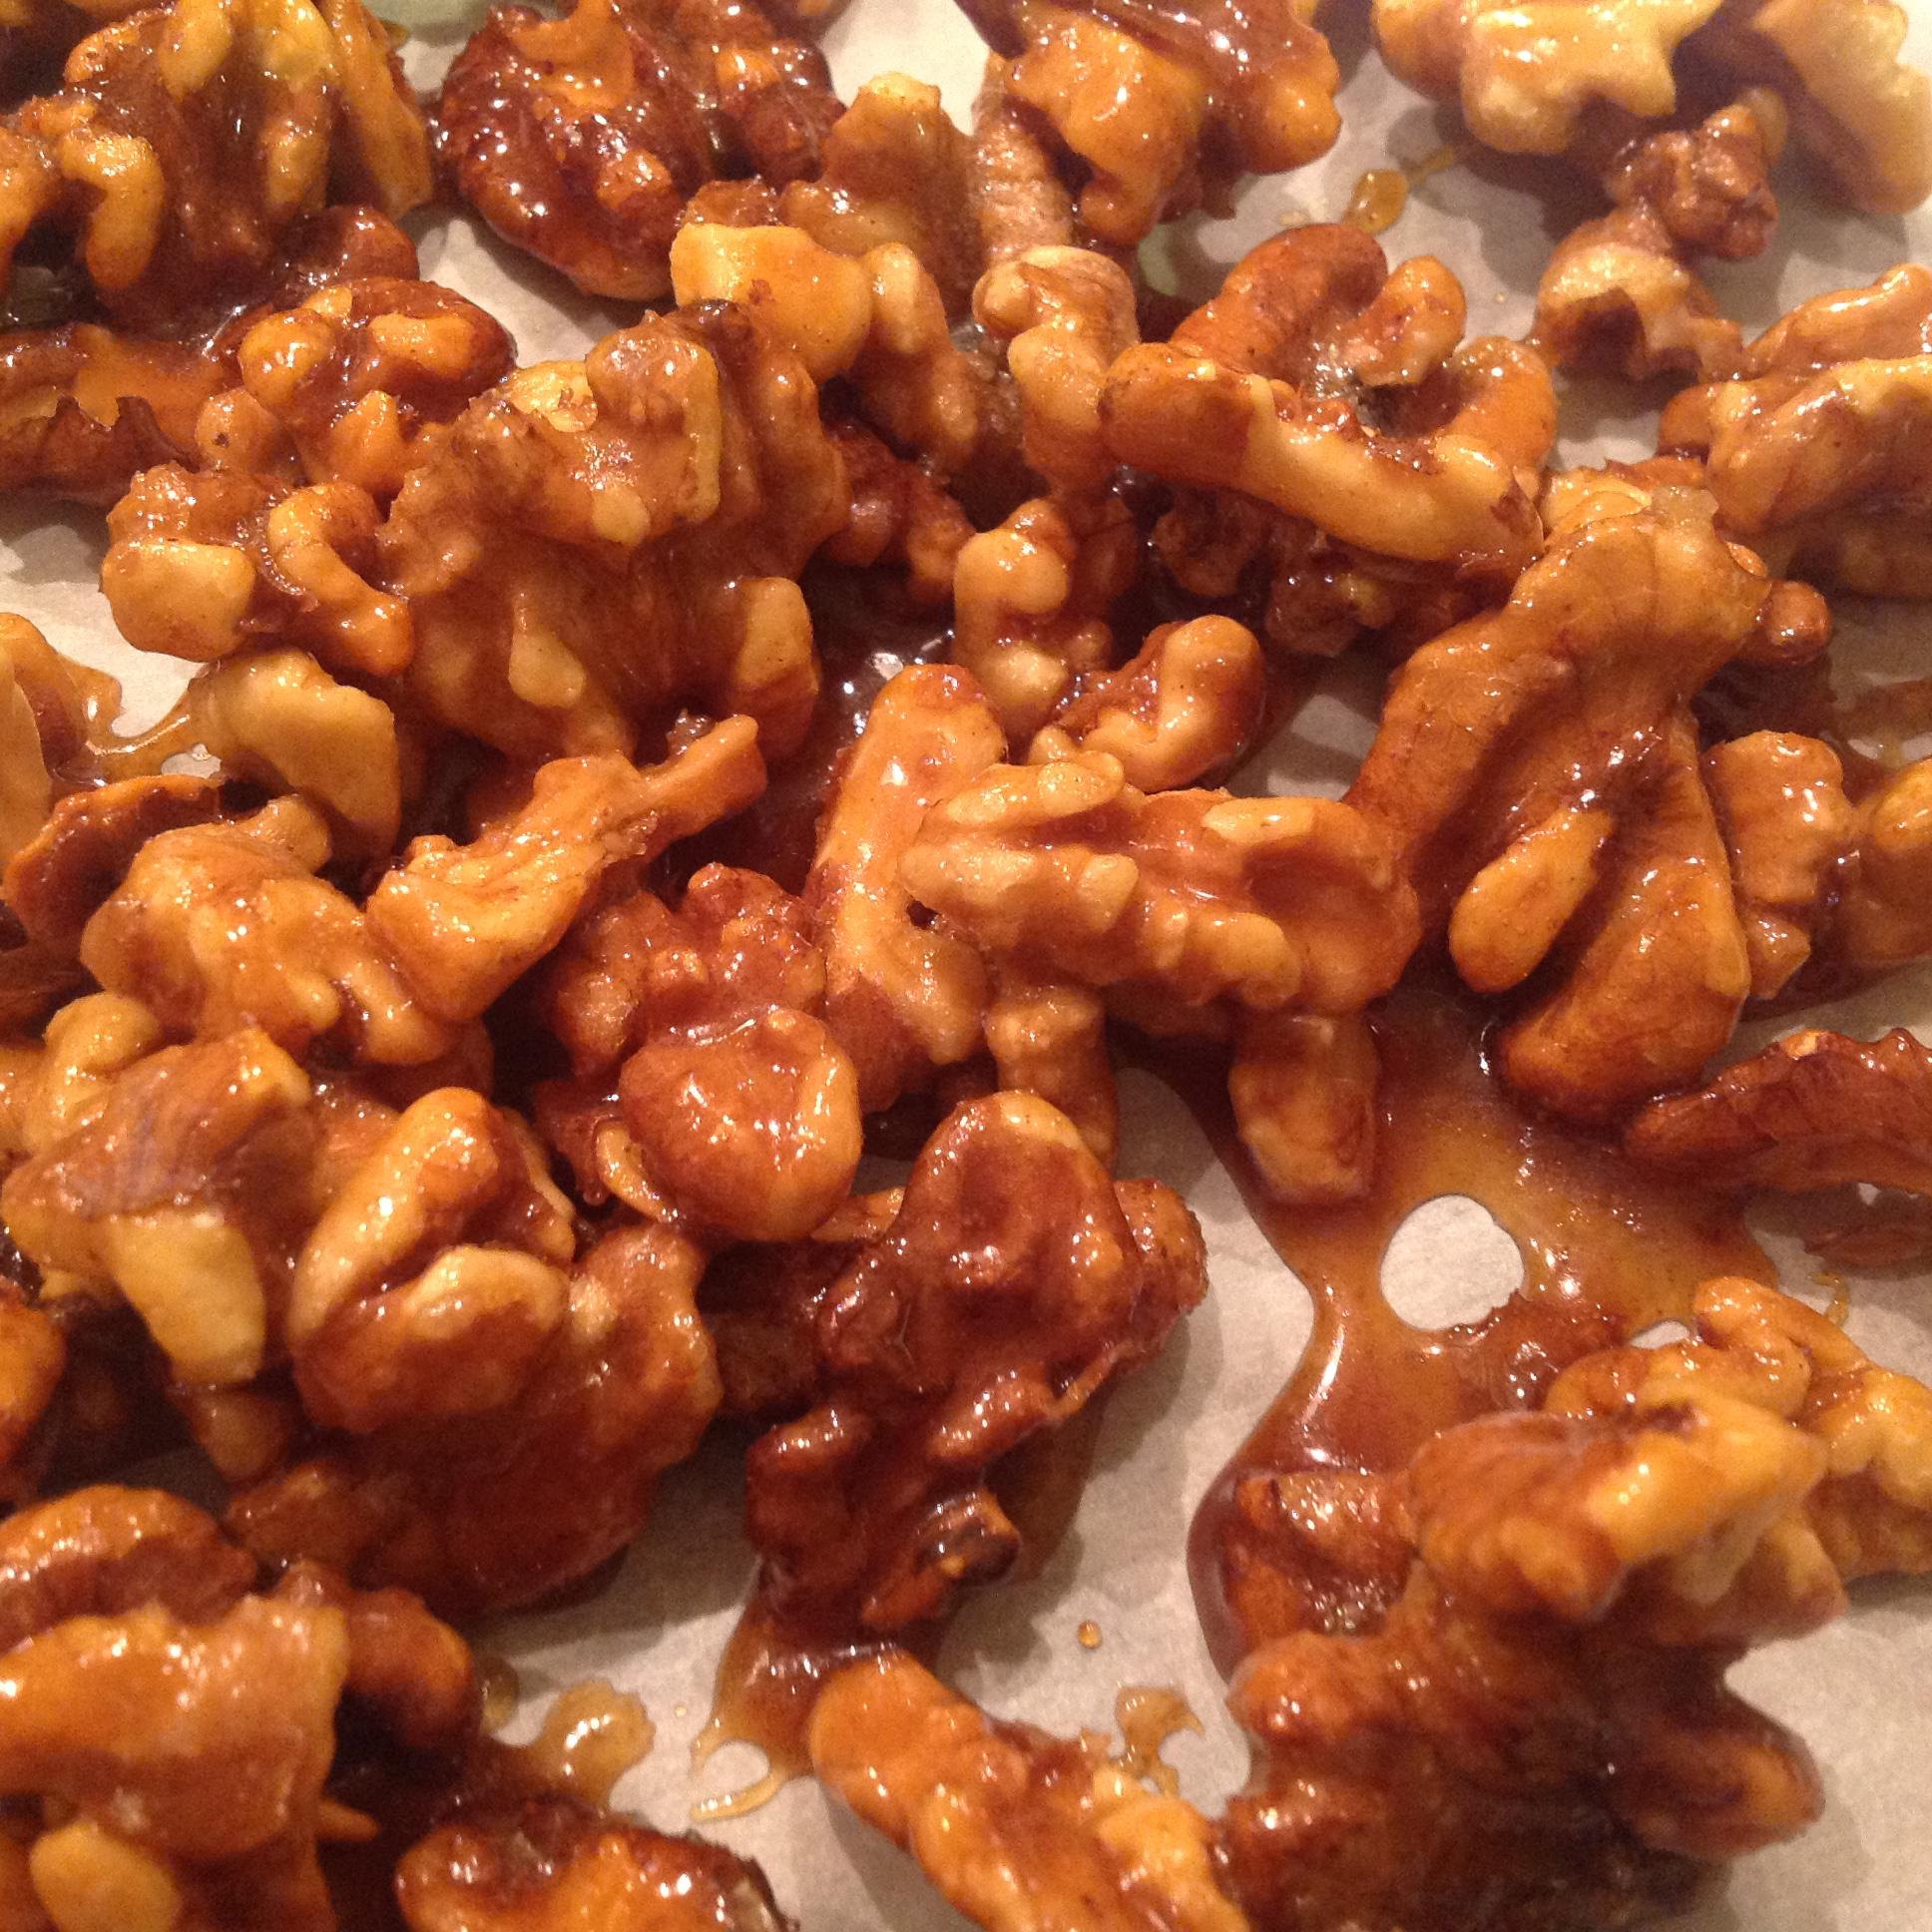 Sugar Glazed Walnuts Nenah B